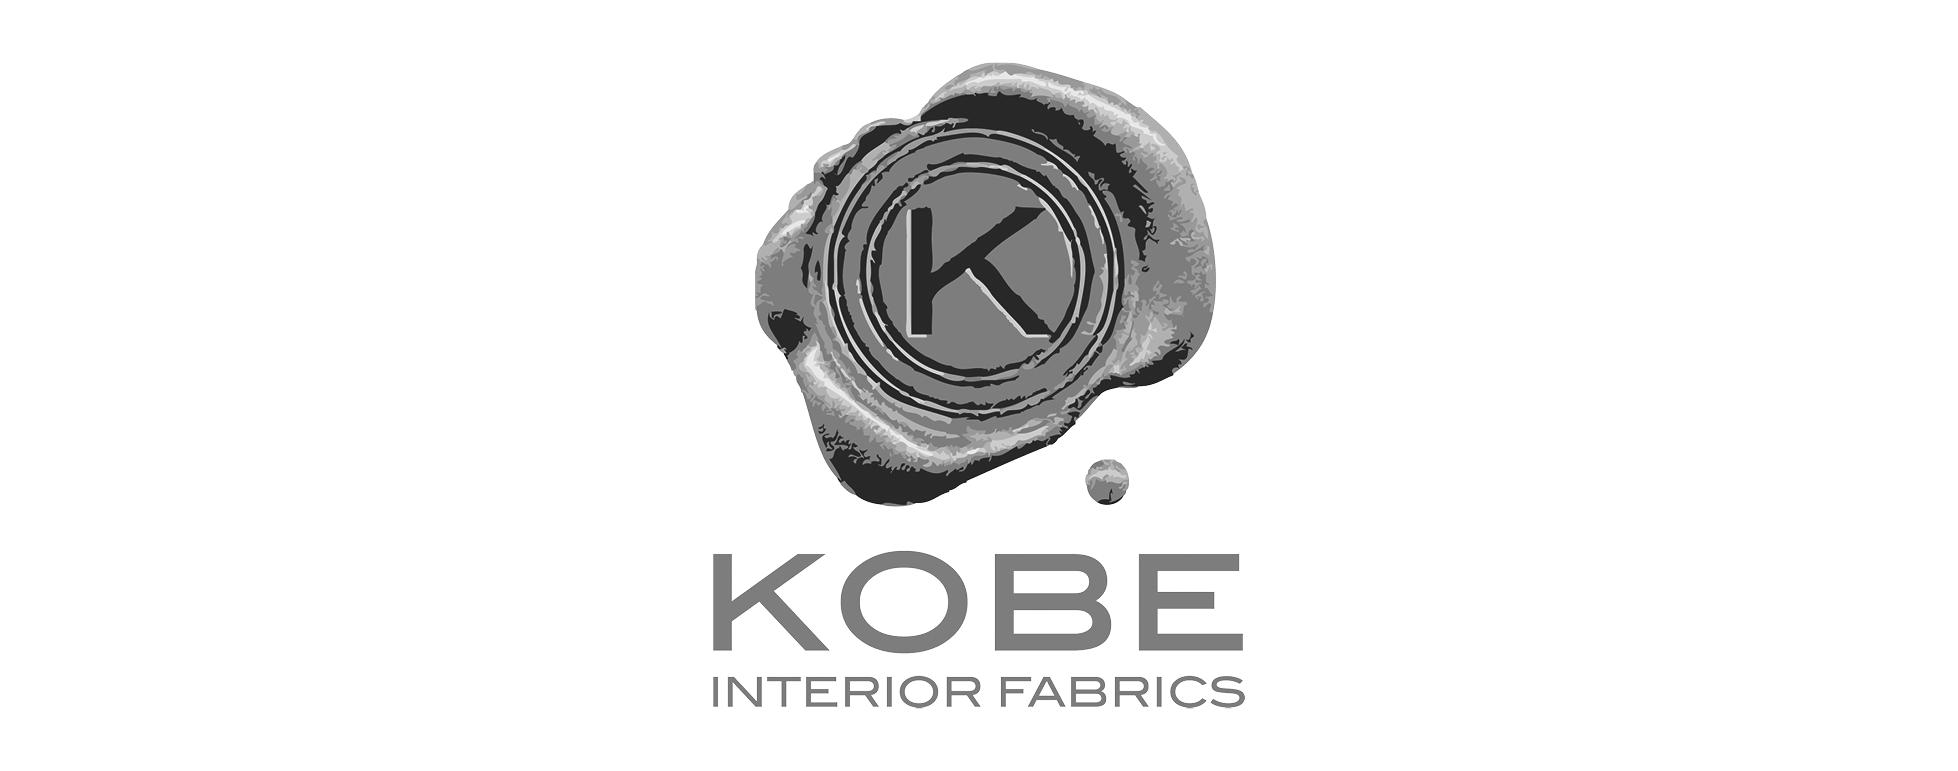 Kobe Interior Fabrics